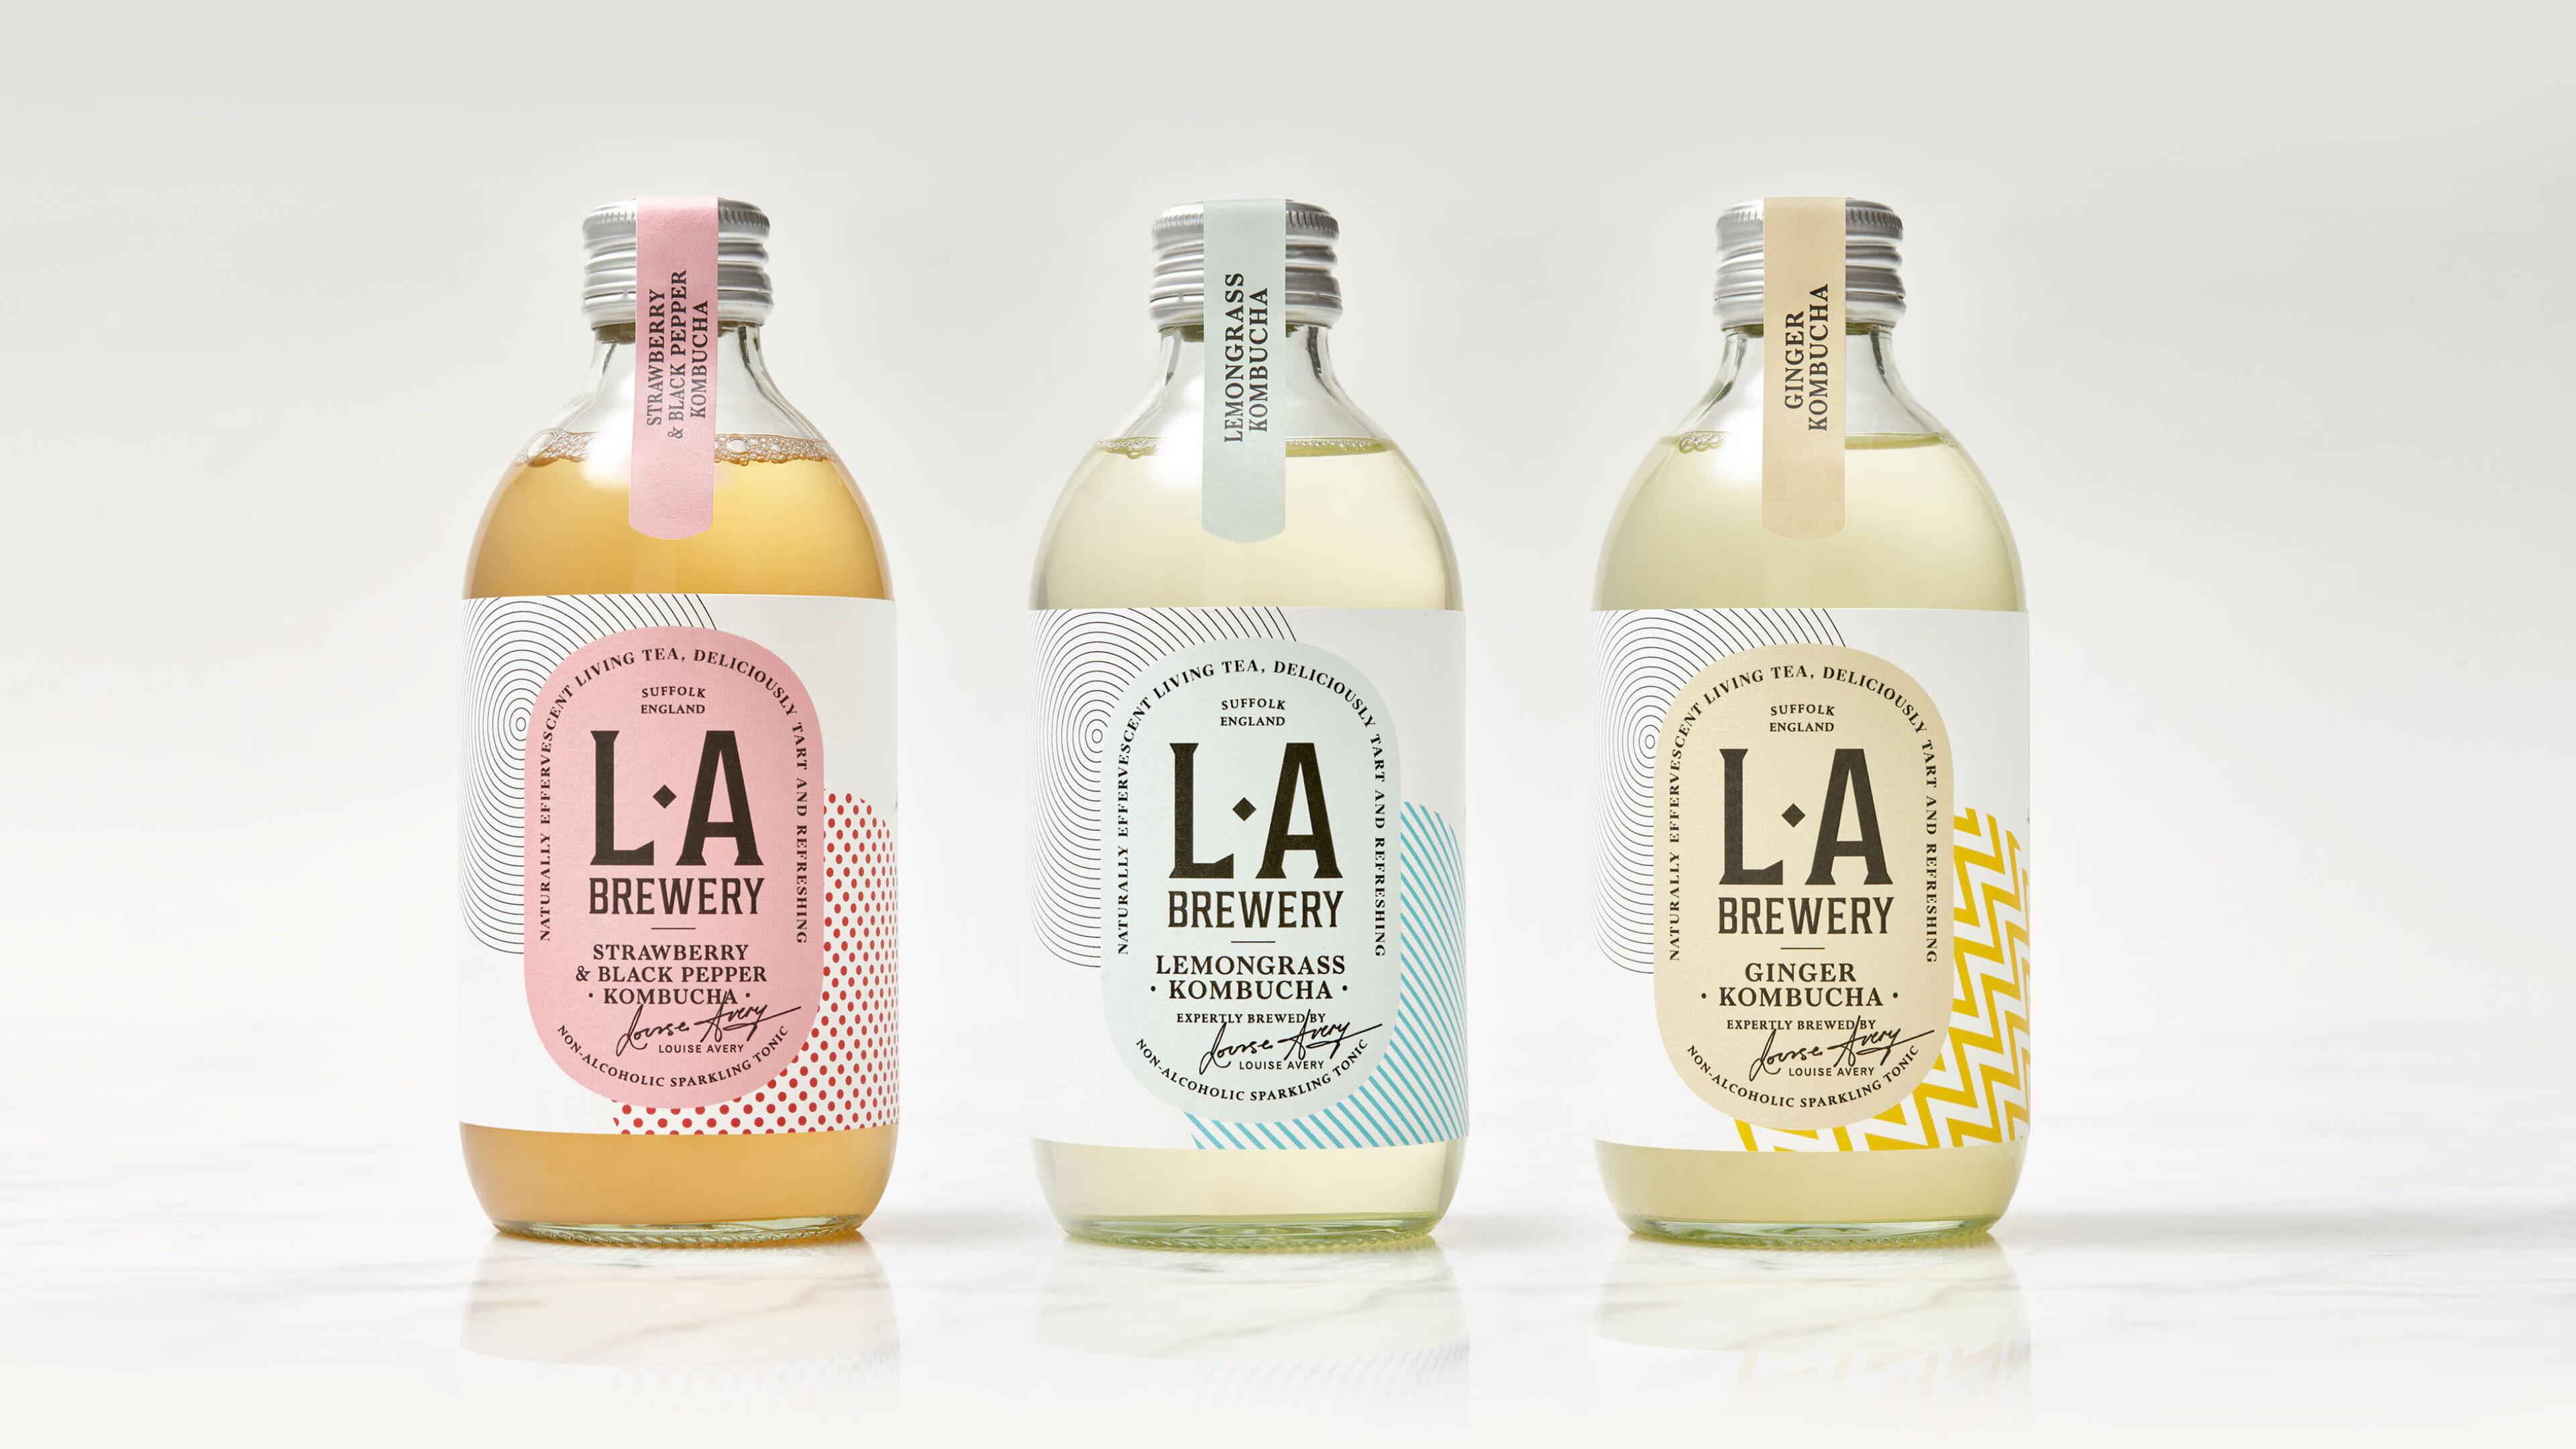 LA Brewery 1 Retouch